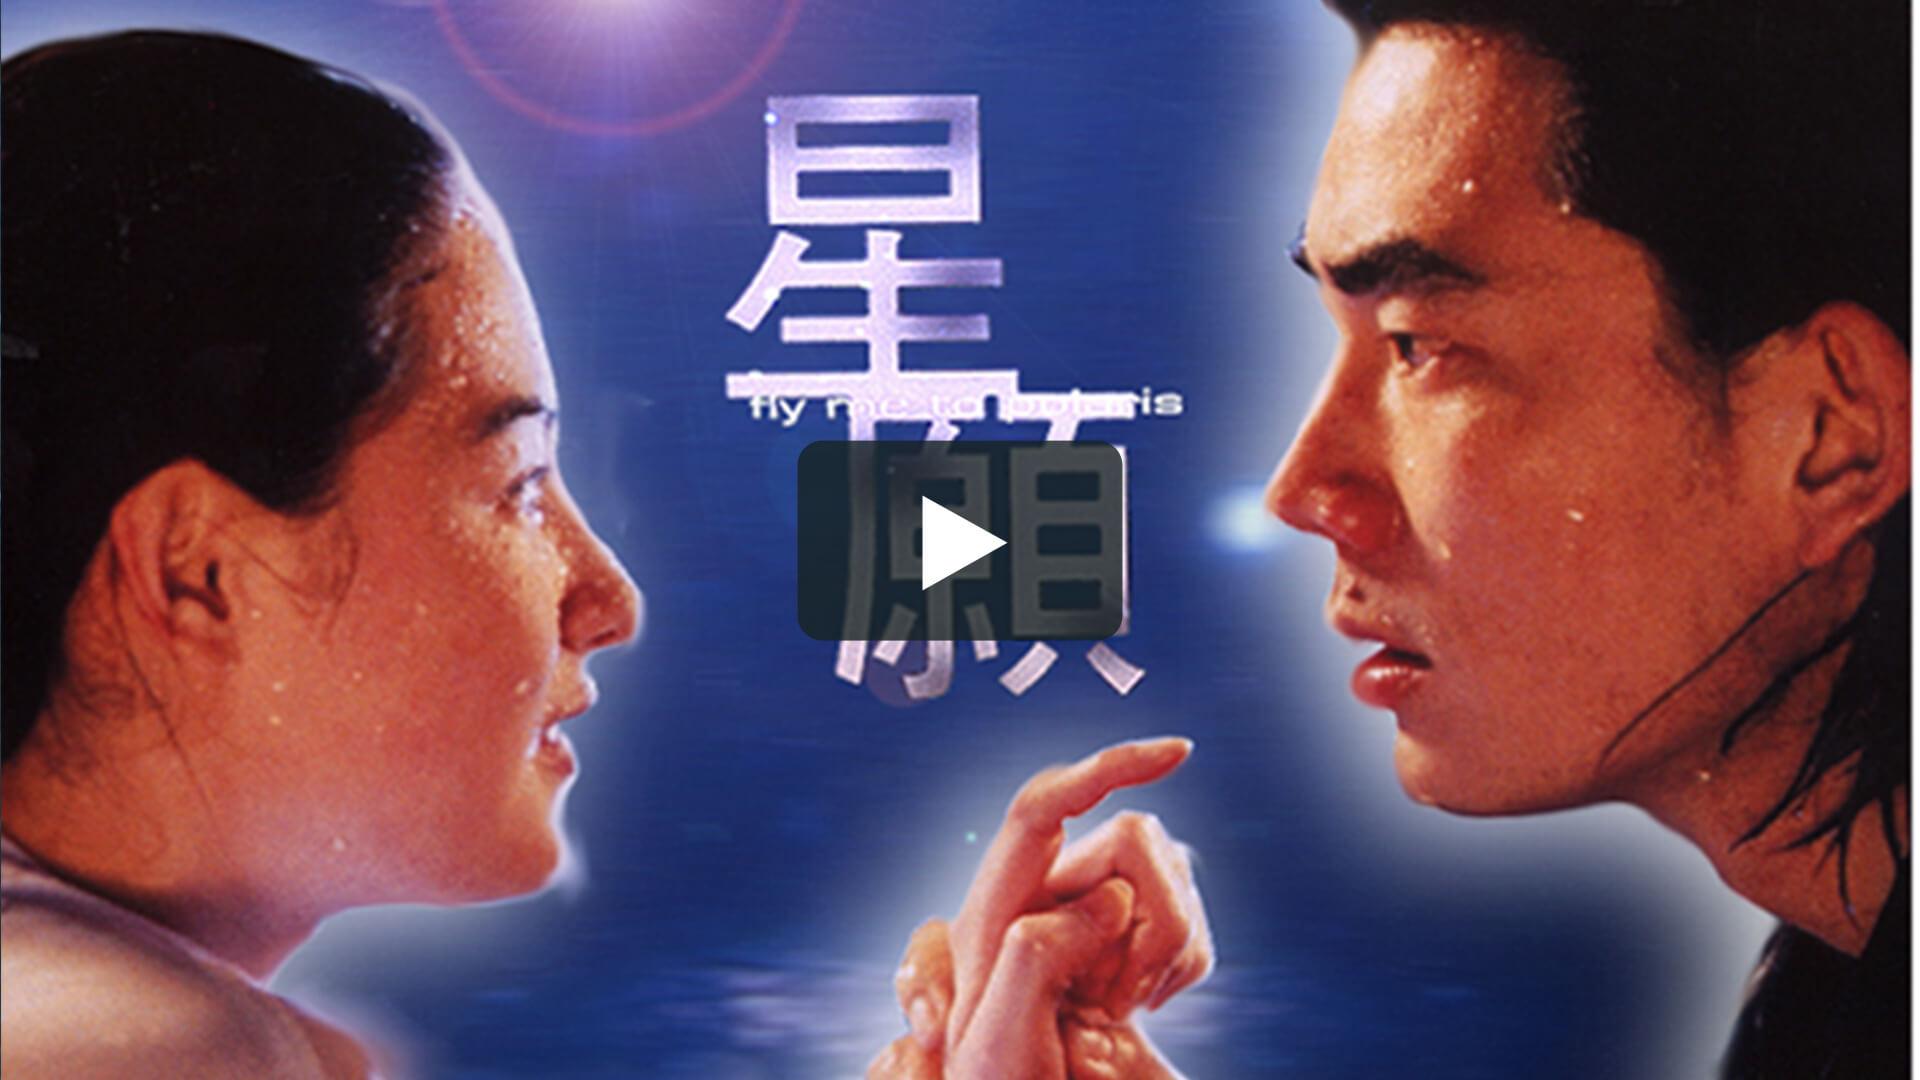 星願 - Fly Me To Polaris